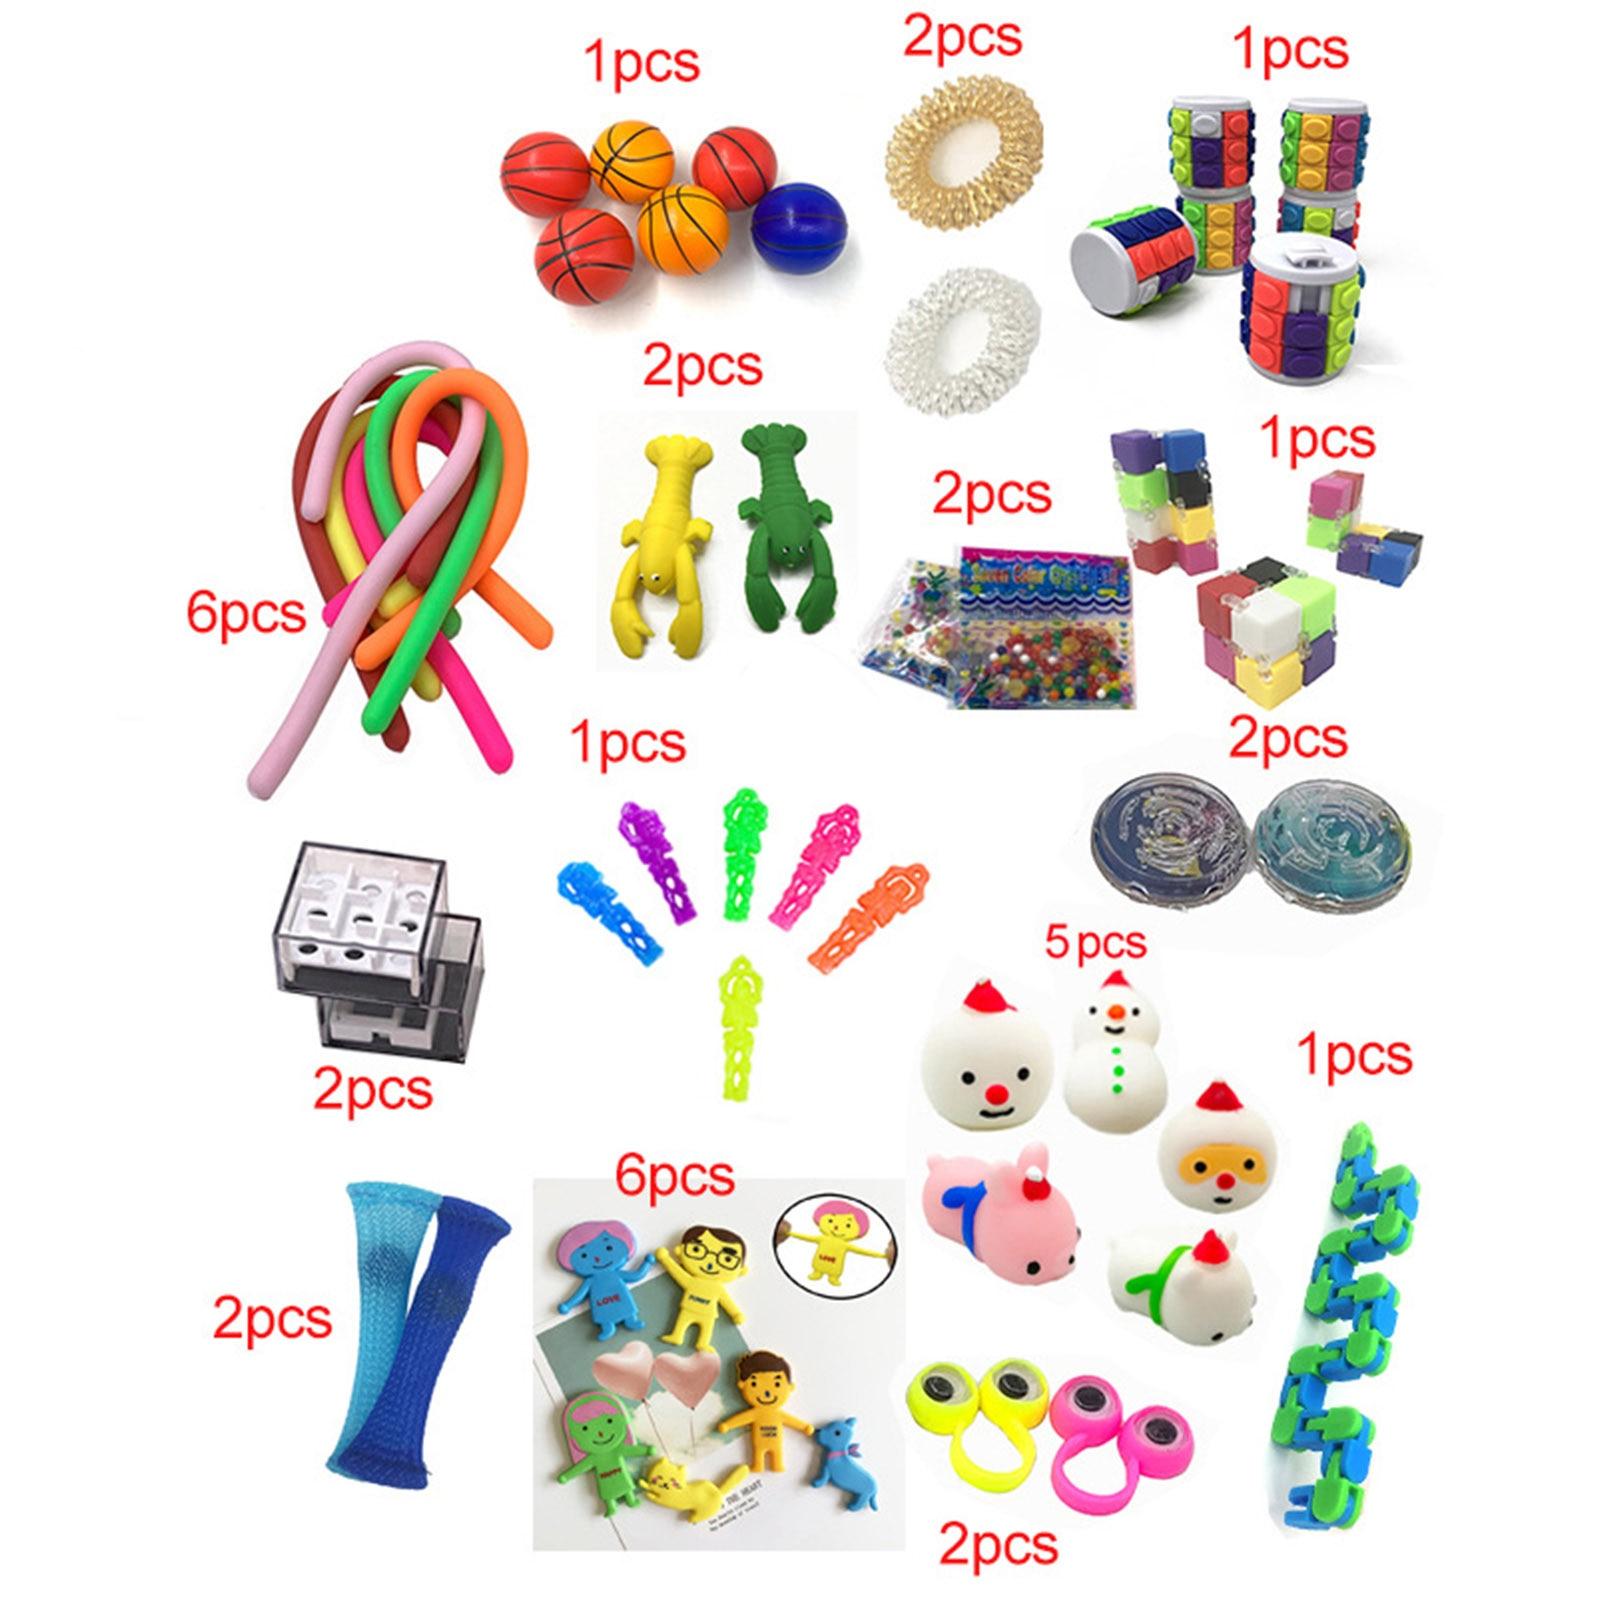 Sensory Fidget Toy Set 50 PCS Fidget Sensory Toys Set Autism Stress Relief Special Need Education Adult Tool To Relieve enlarge